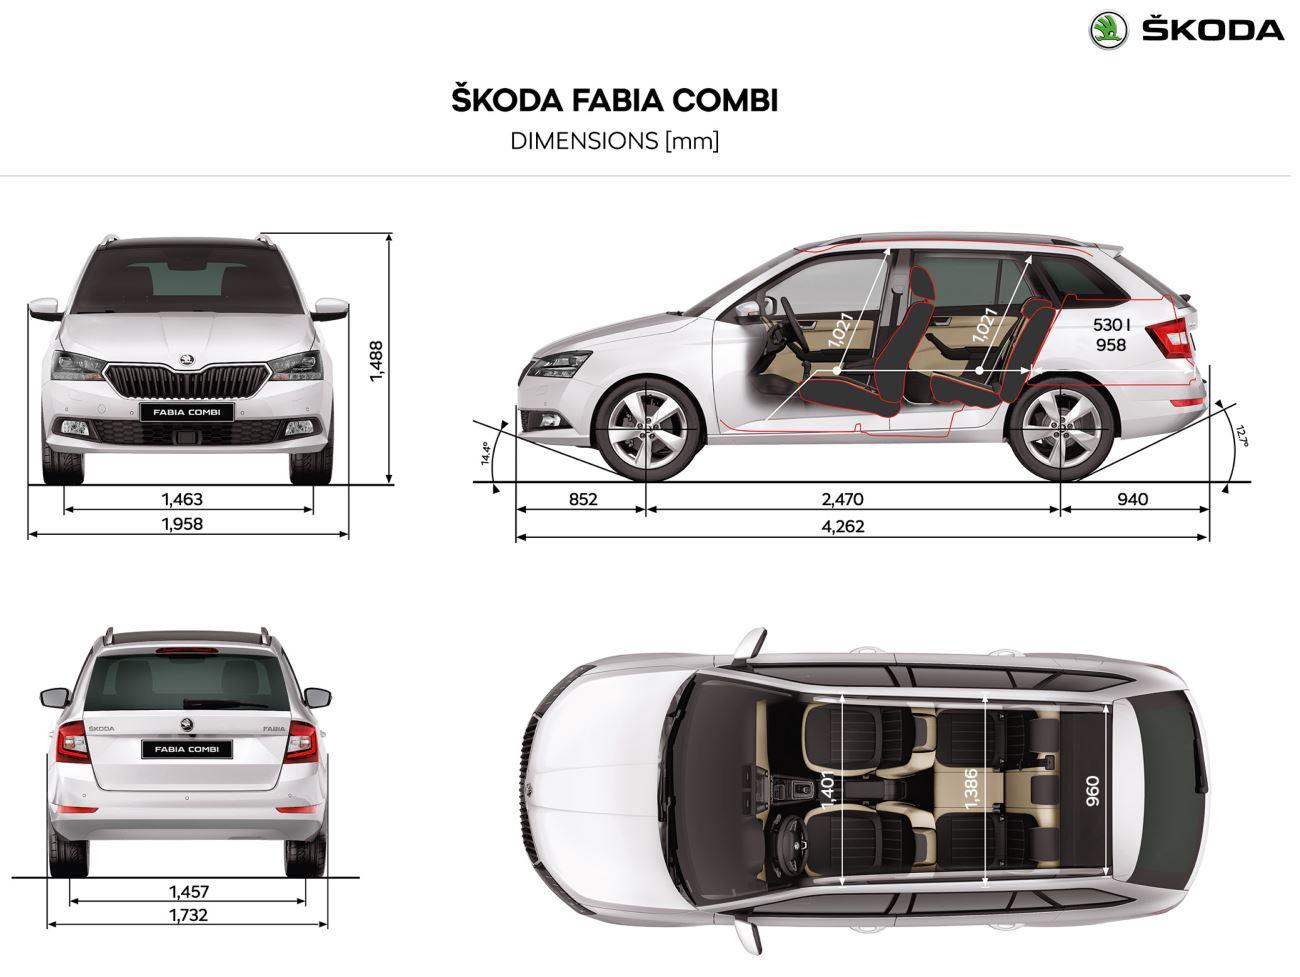 Rozměry Škoda Fabia Combi 3 generace